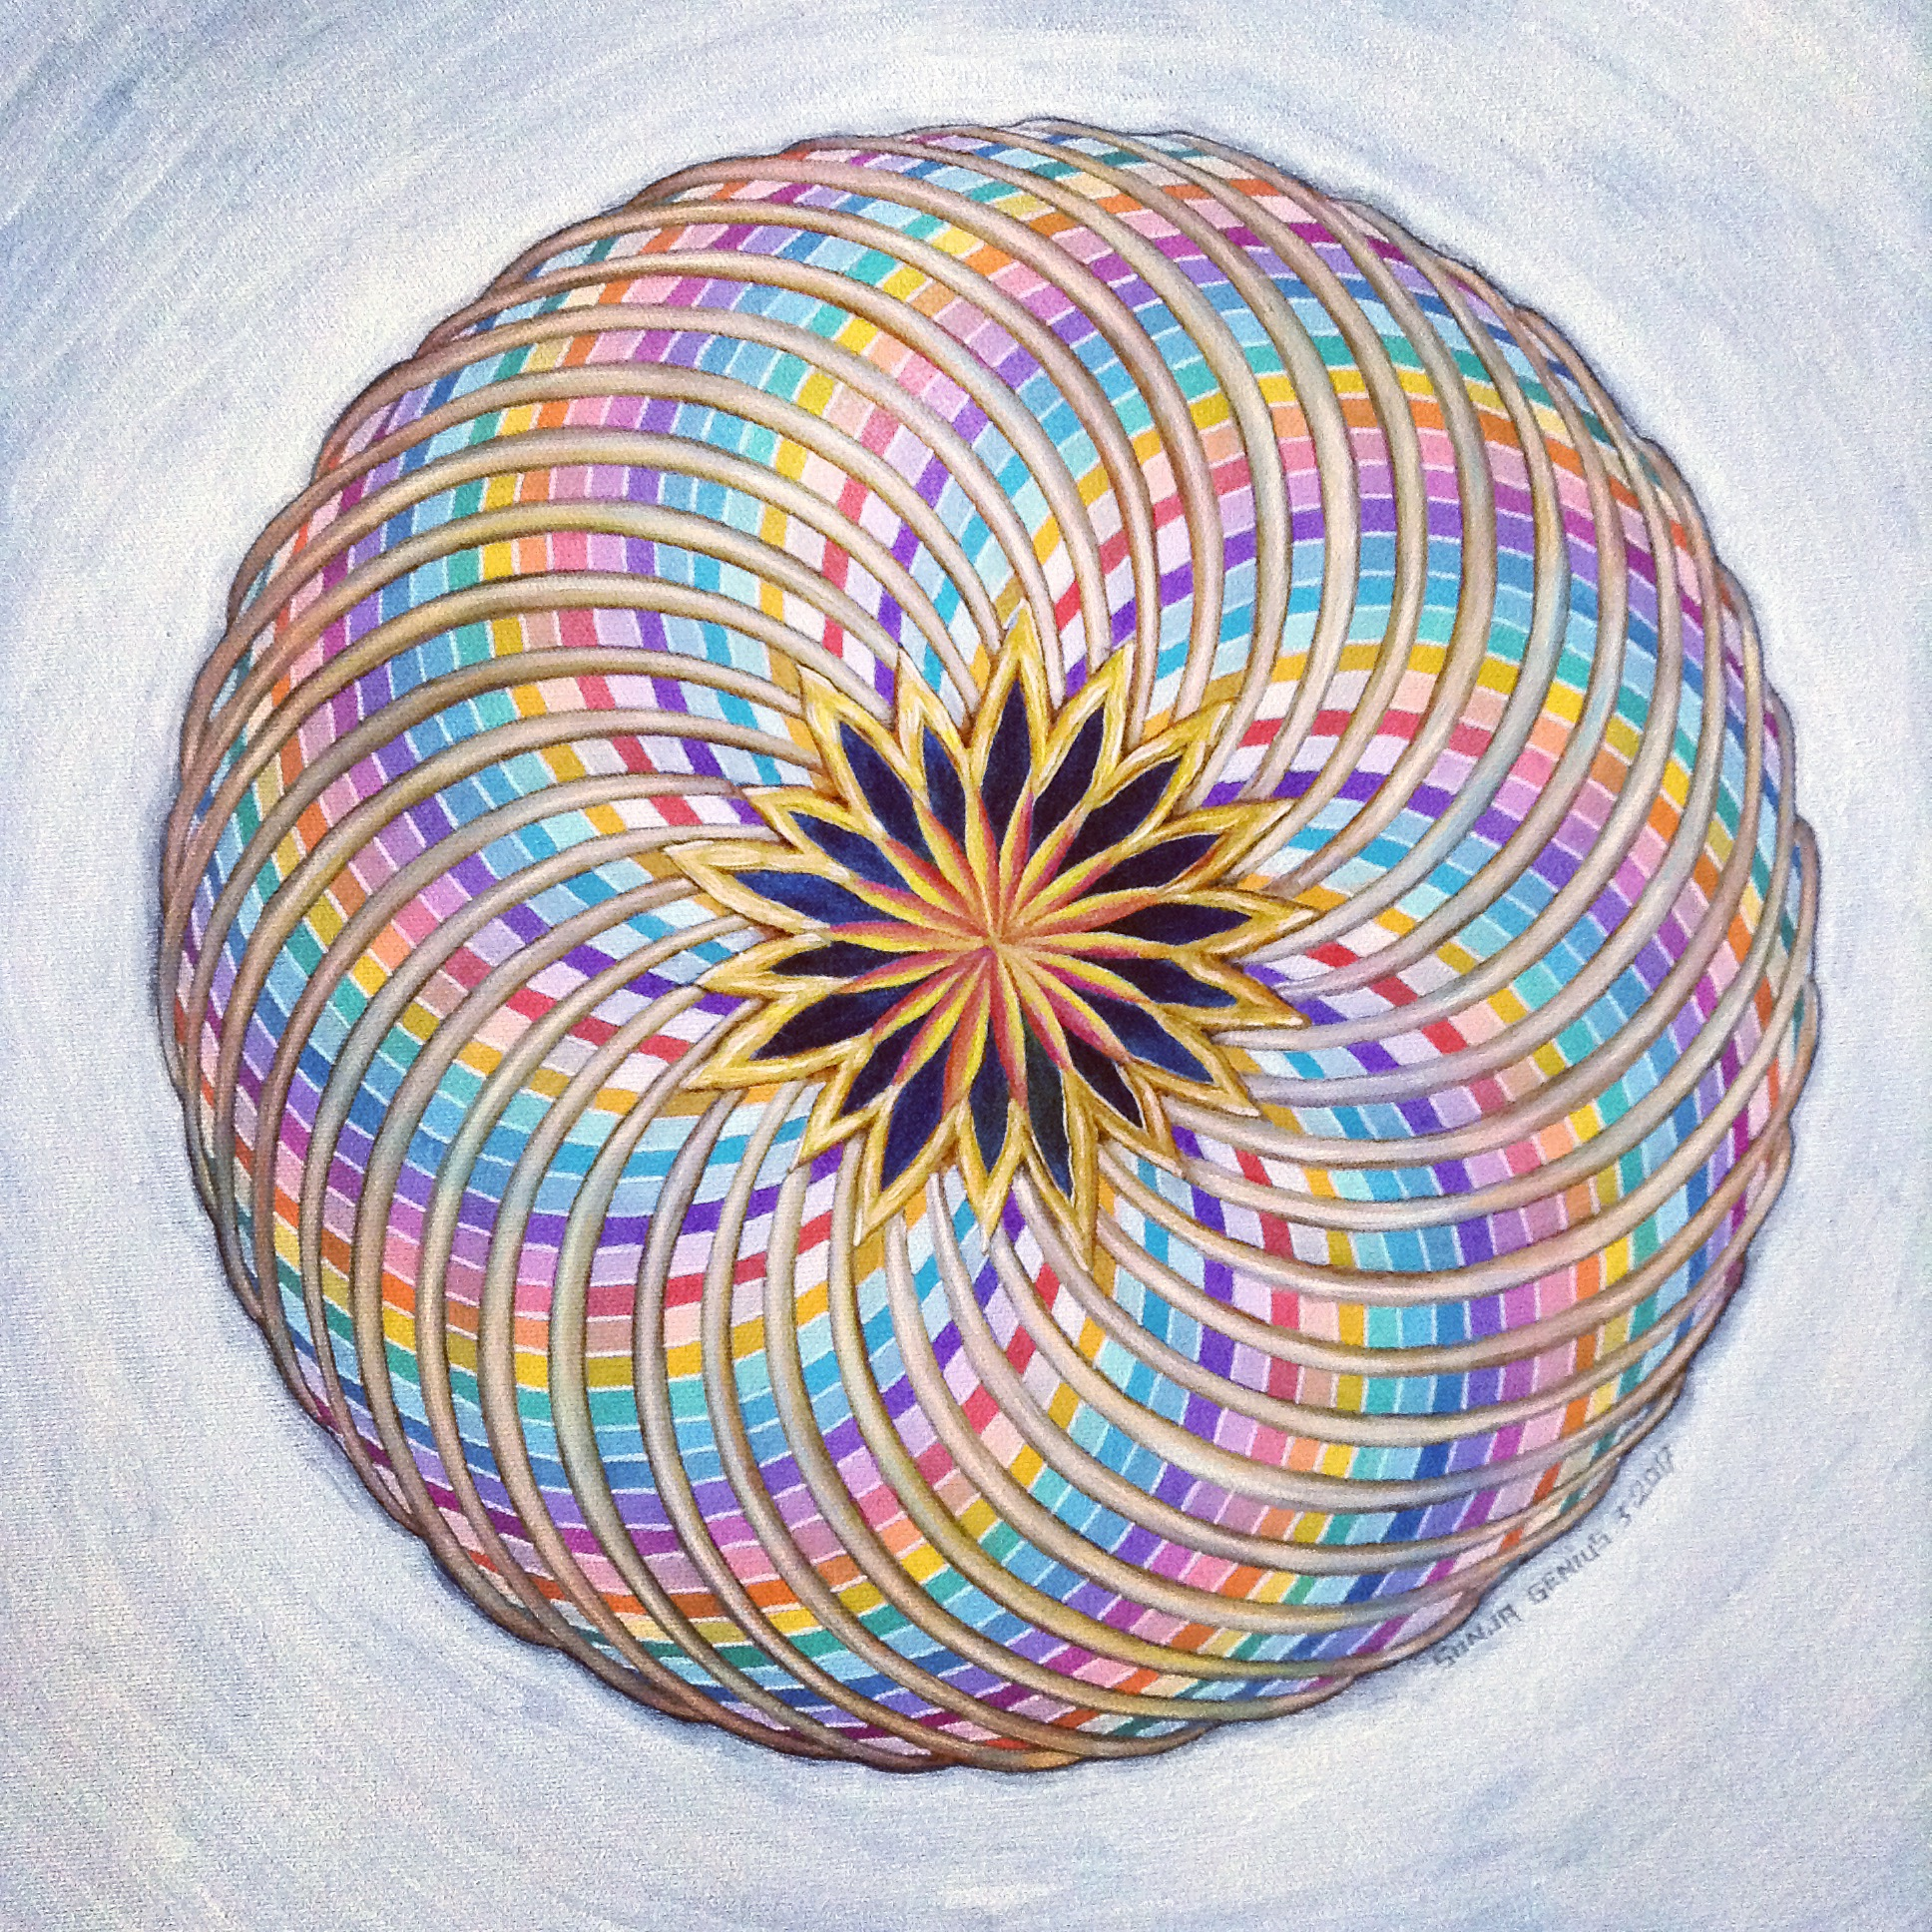 Rainbow Torus, oil on canvas 16x16, March 2017 (4)